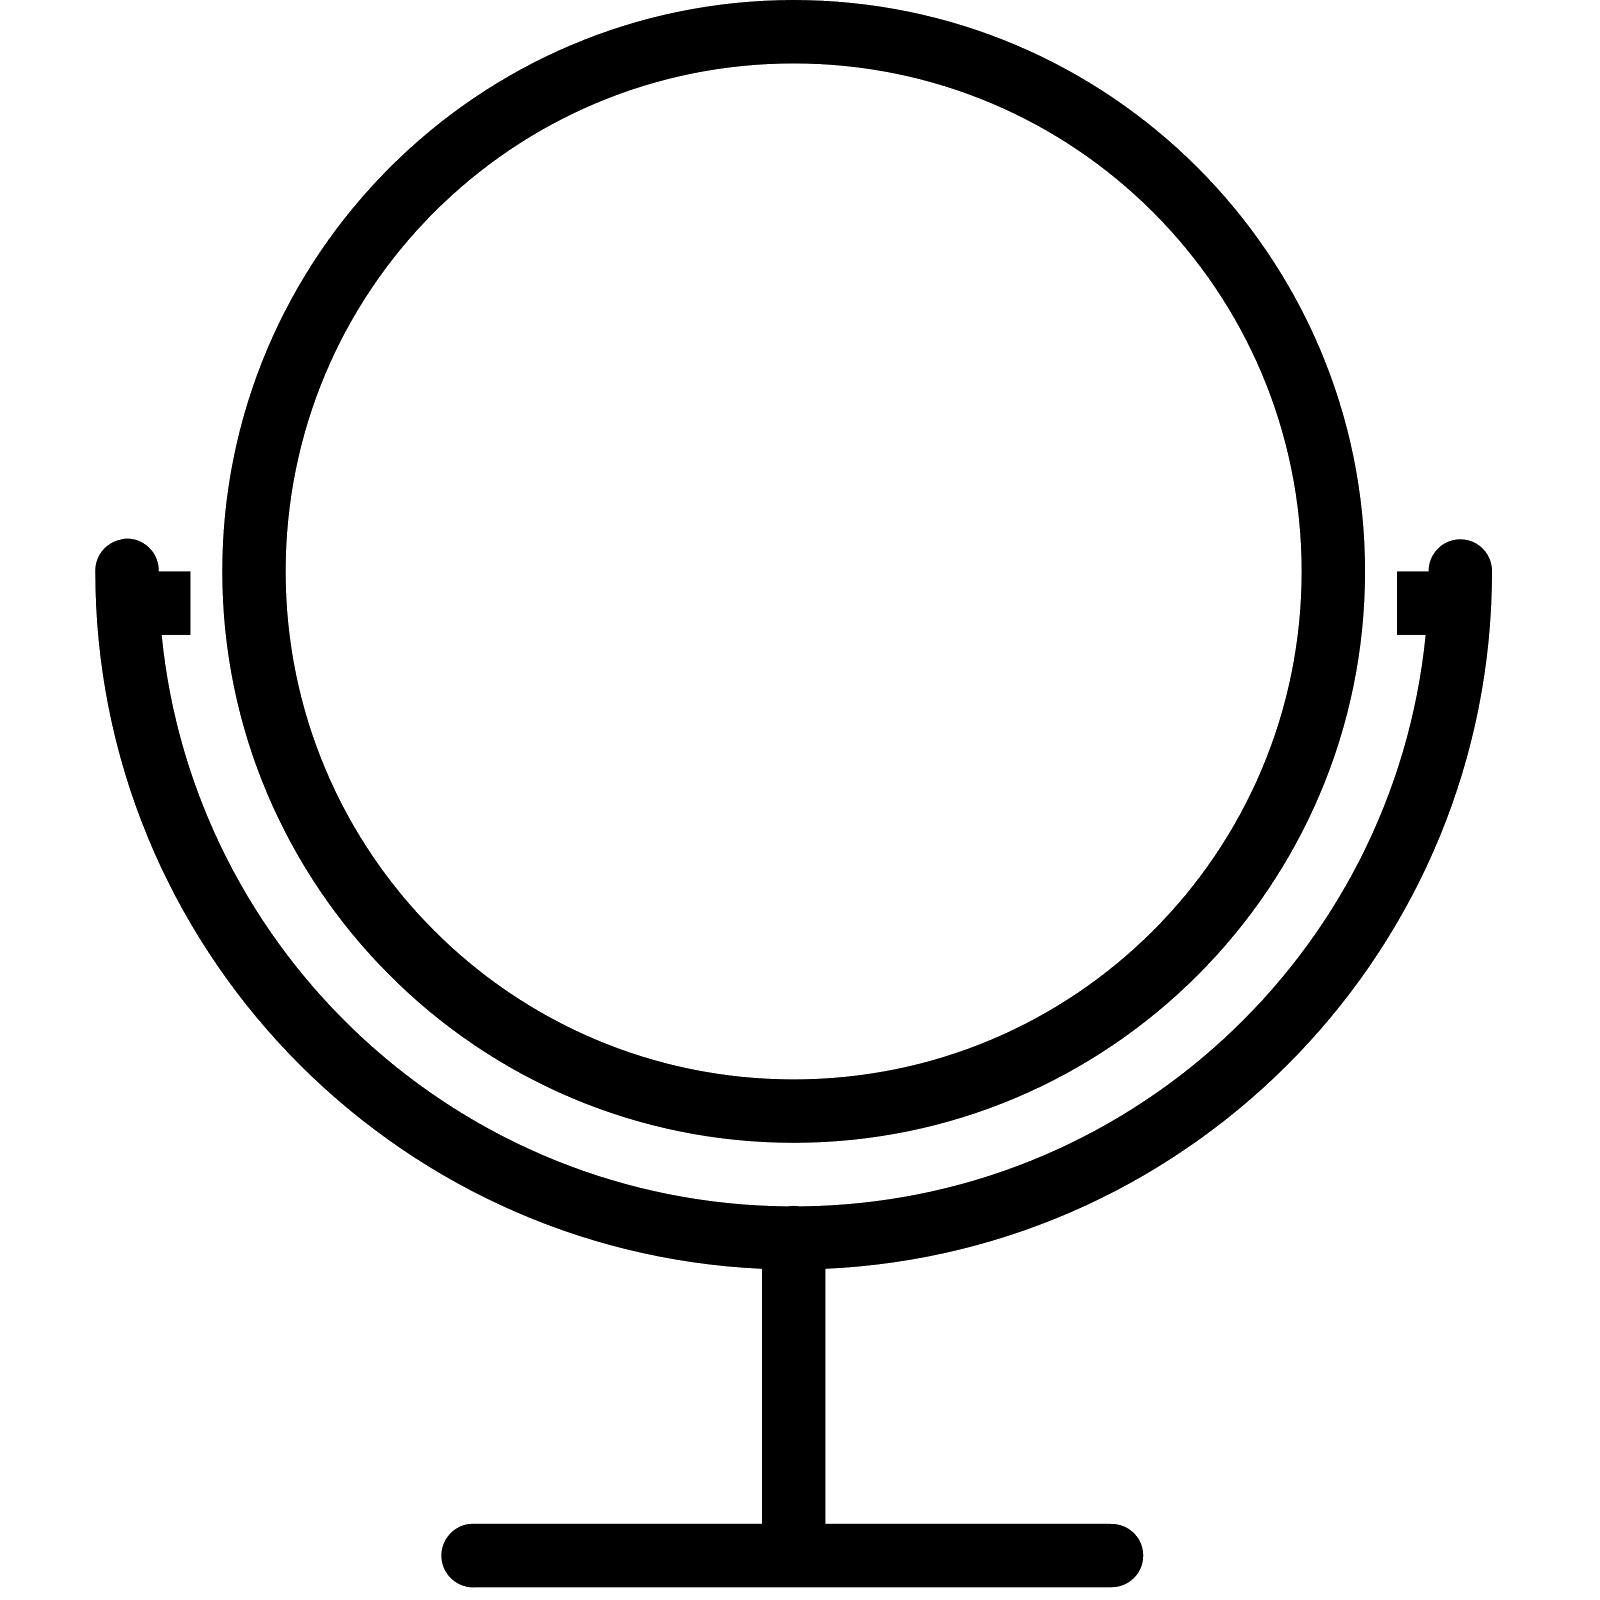 Mirror PNG HD image, Mirror Frame Transparent Download - Free Transparent PNG Logos